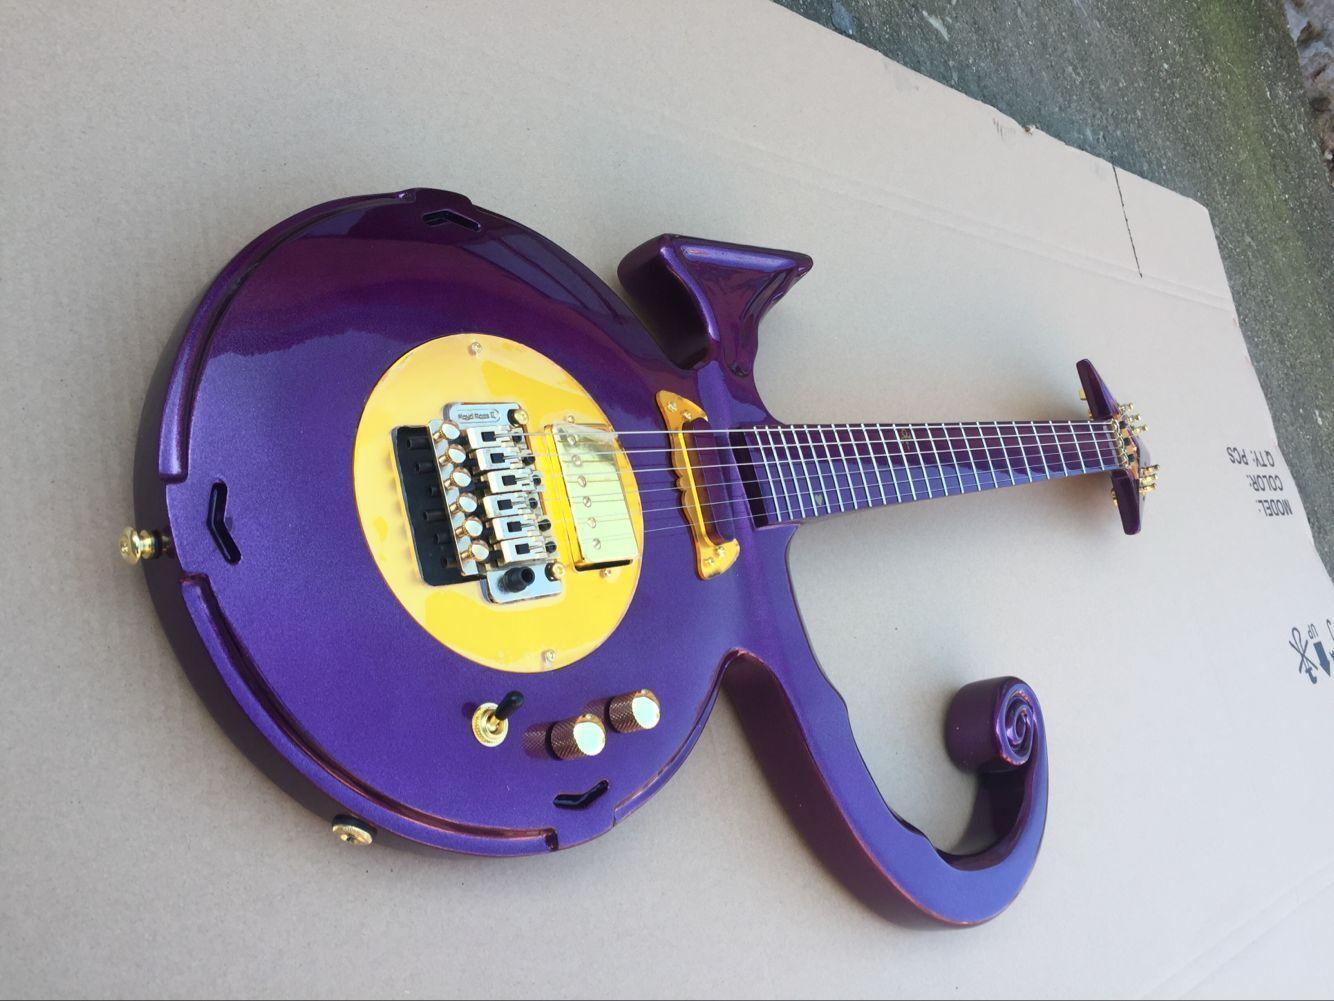 Electric guitar body shapes online electric guitar body shapes unique rare shaped guitar metallic purple pince symbol electric guitar floyd rose tremolo bridge gold hardware buycottarizona